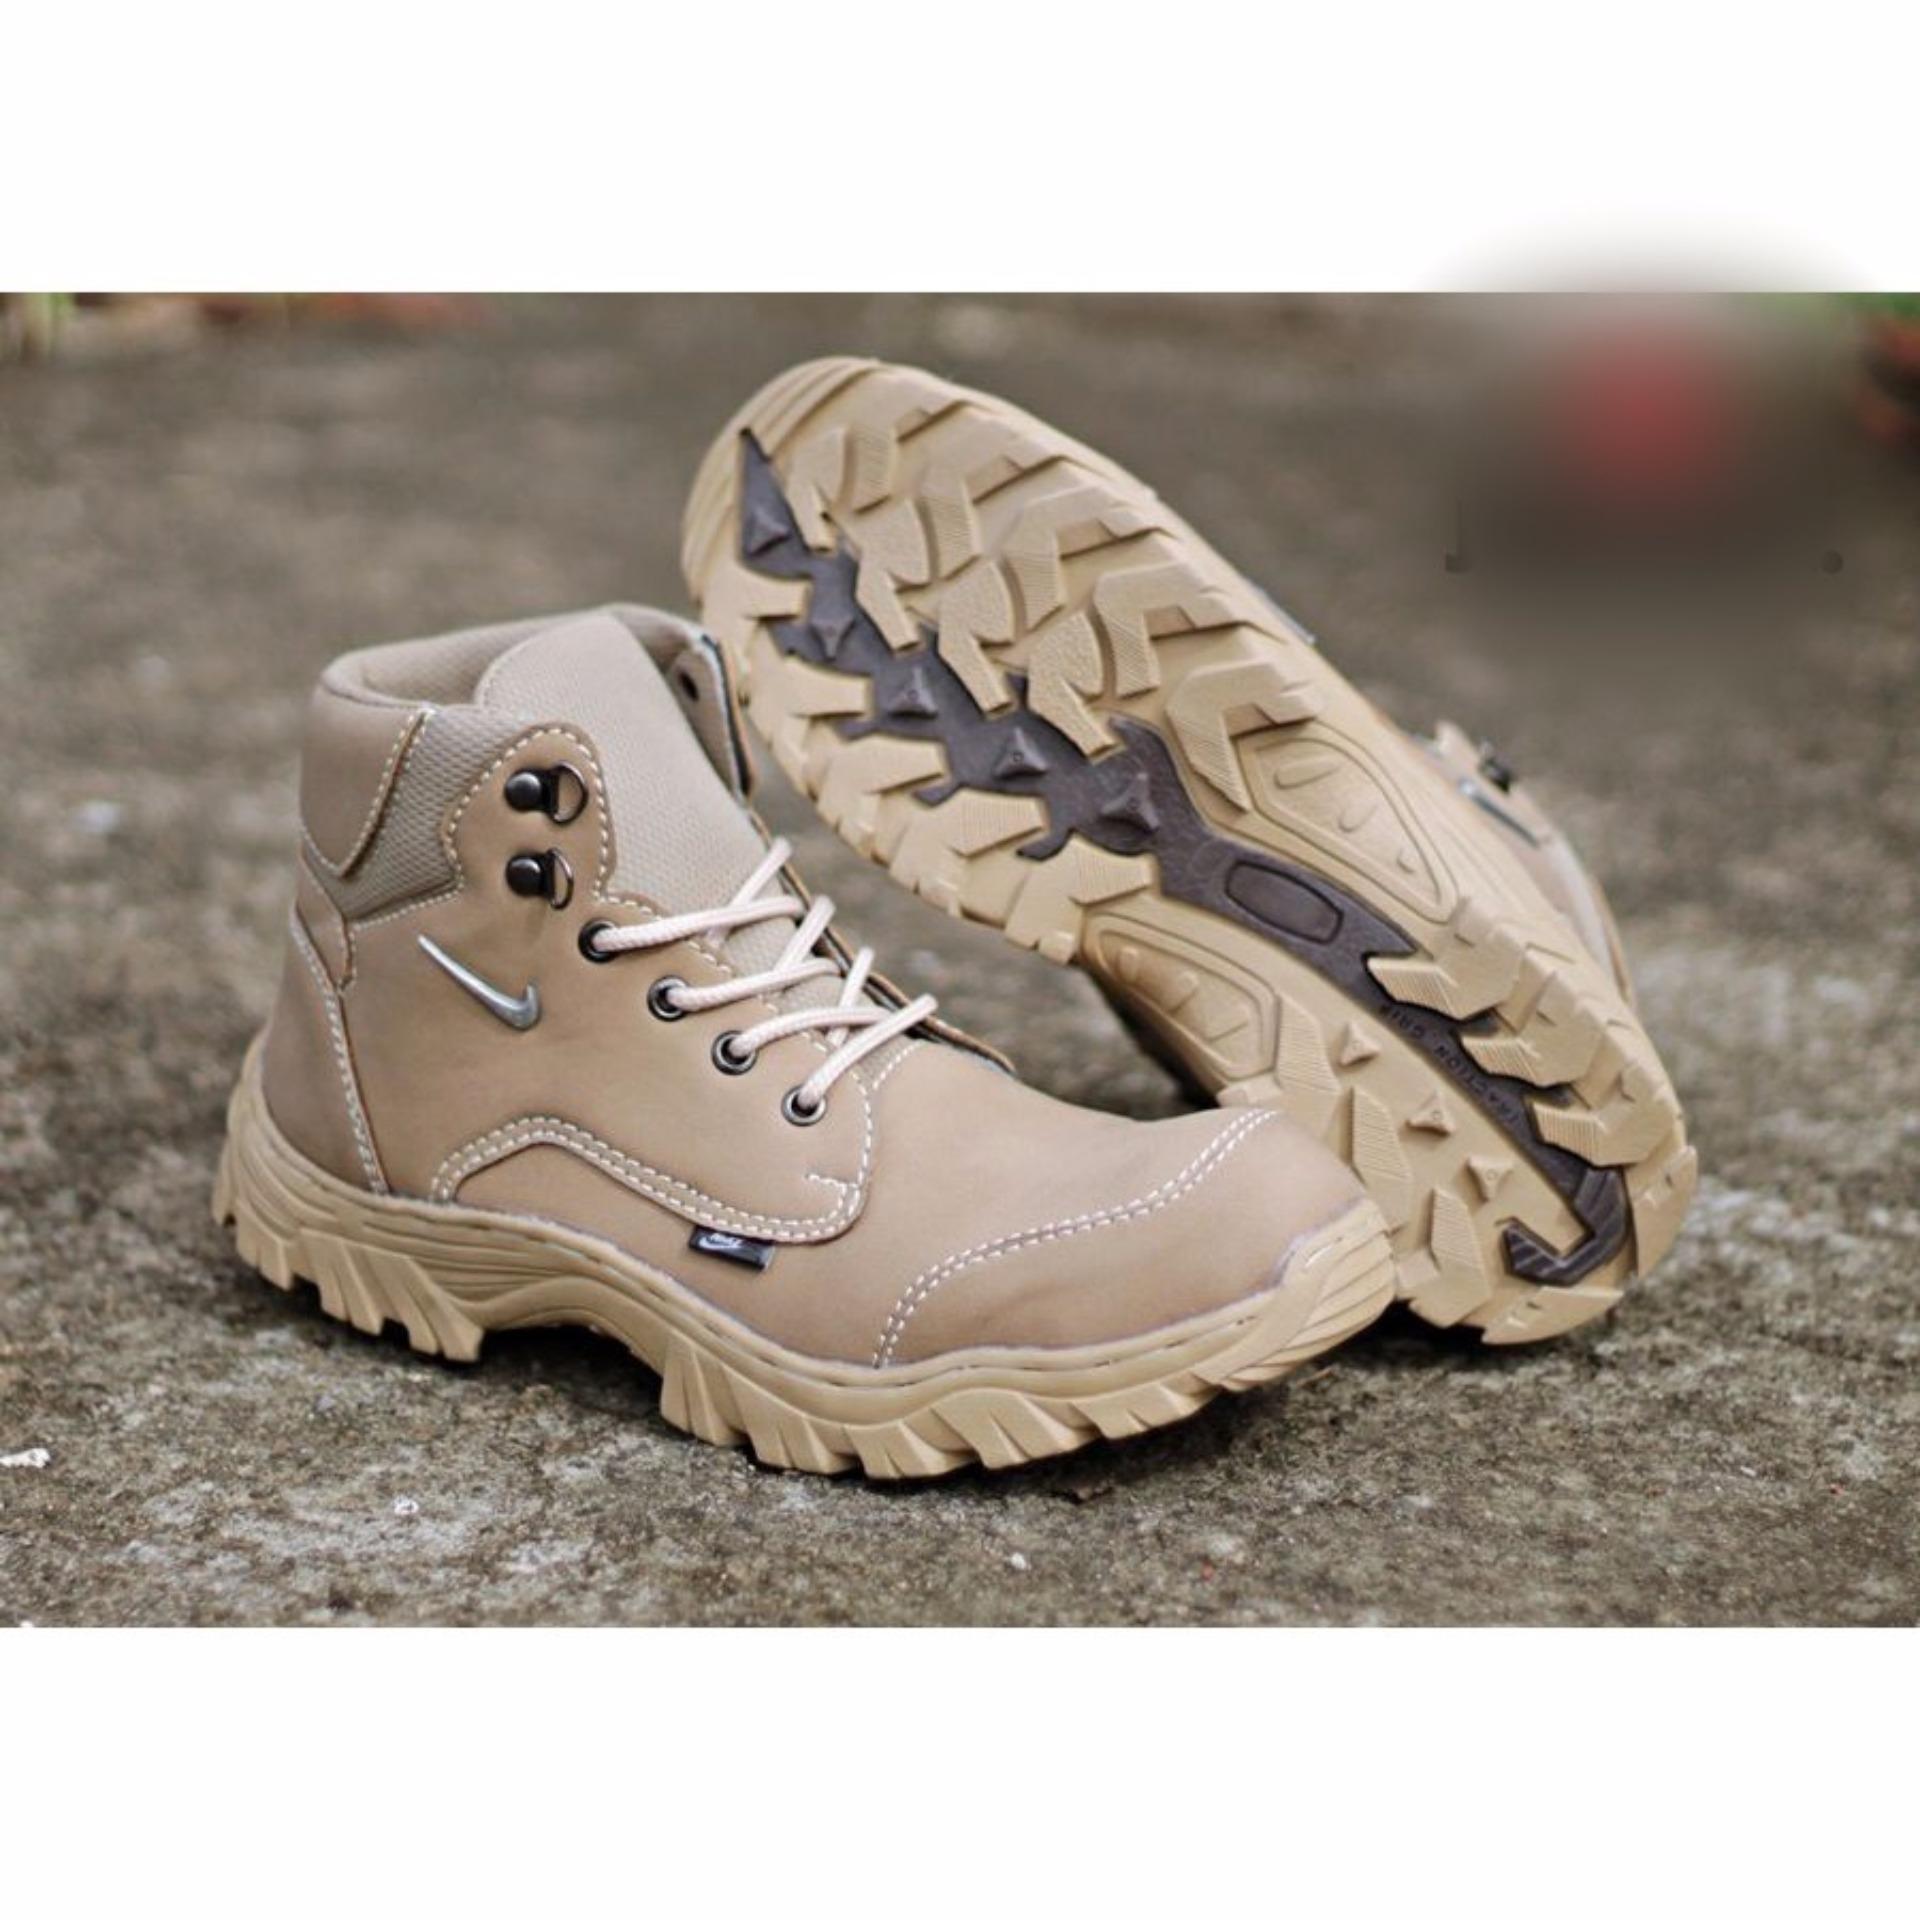 Jual Beli Sepatu Safety Baru Murah Boots Nike California Tracking Ujung Besi Zipper Pria Gunung Boot Fiyu Leather Model Kasual Ga